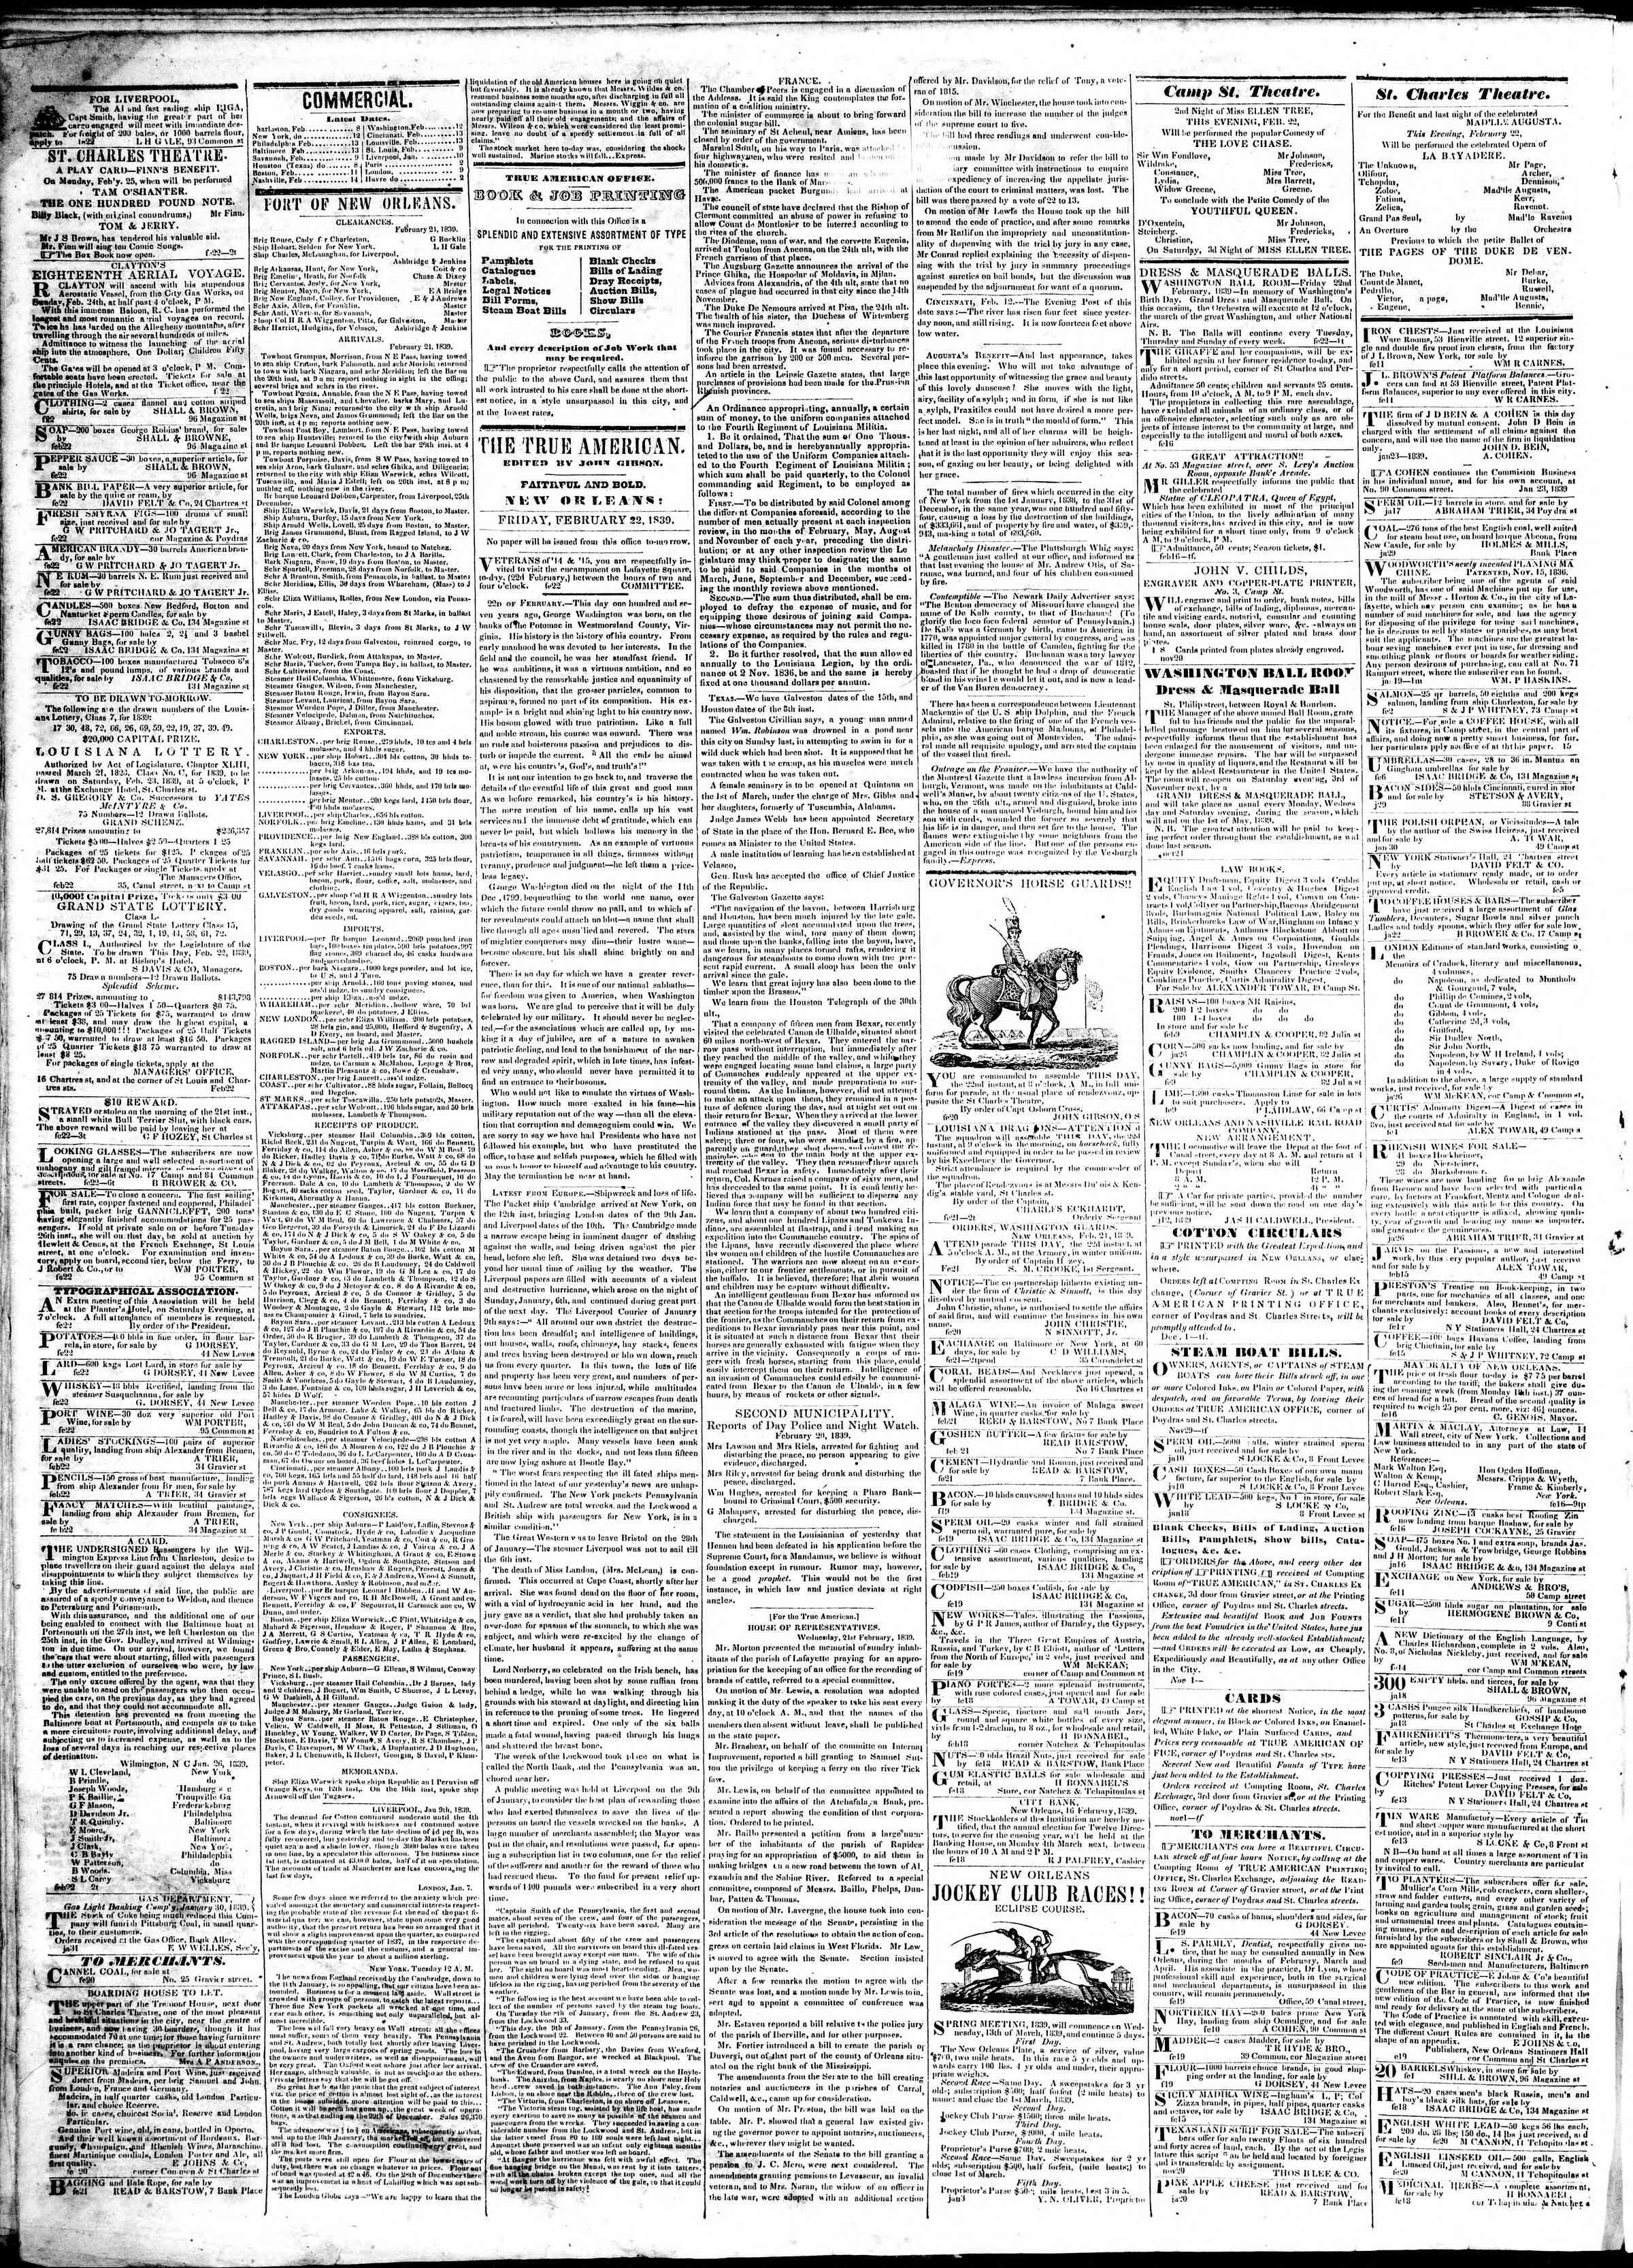 February 22, 1839 Tarihli True American Gazetesi Sayfa 2